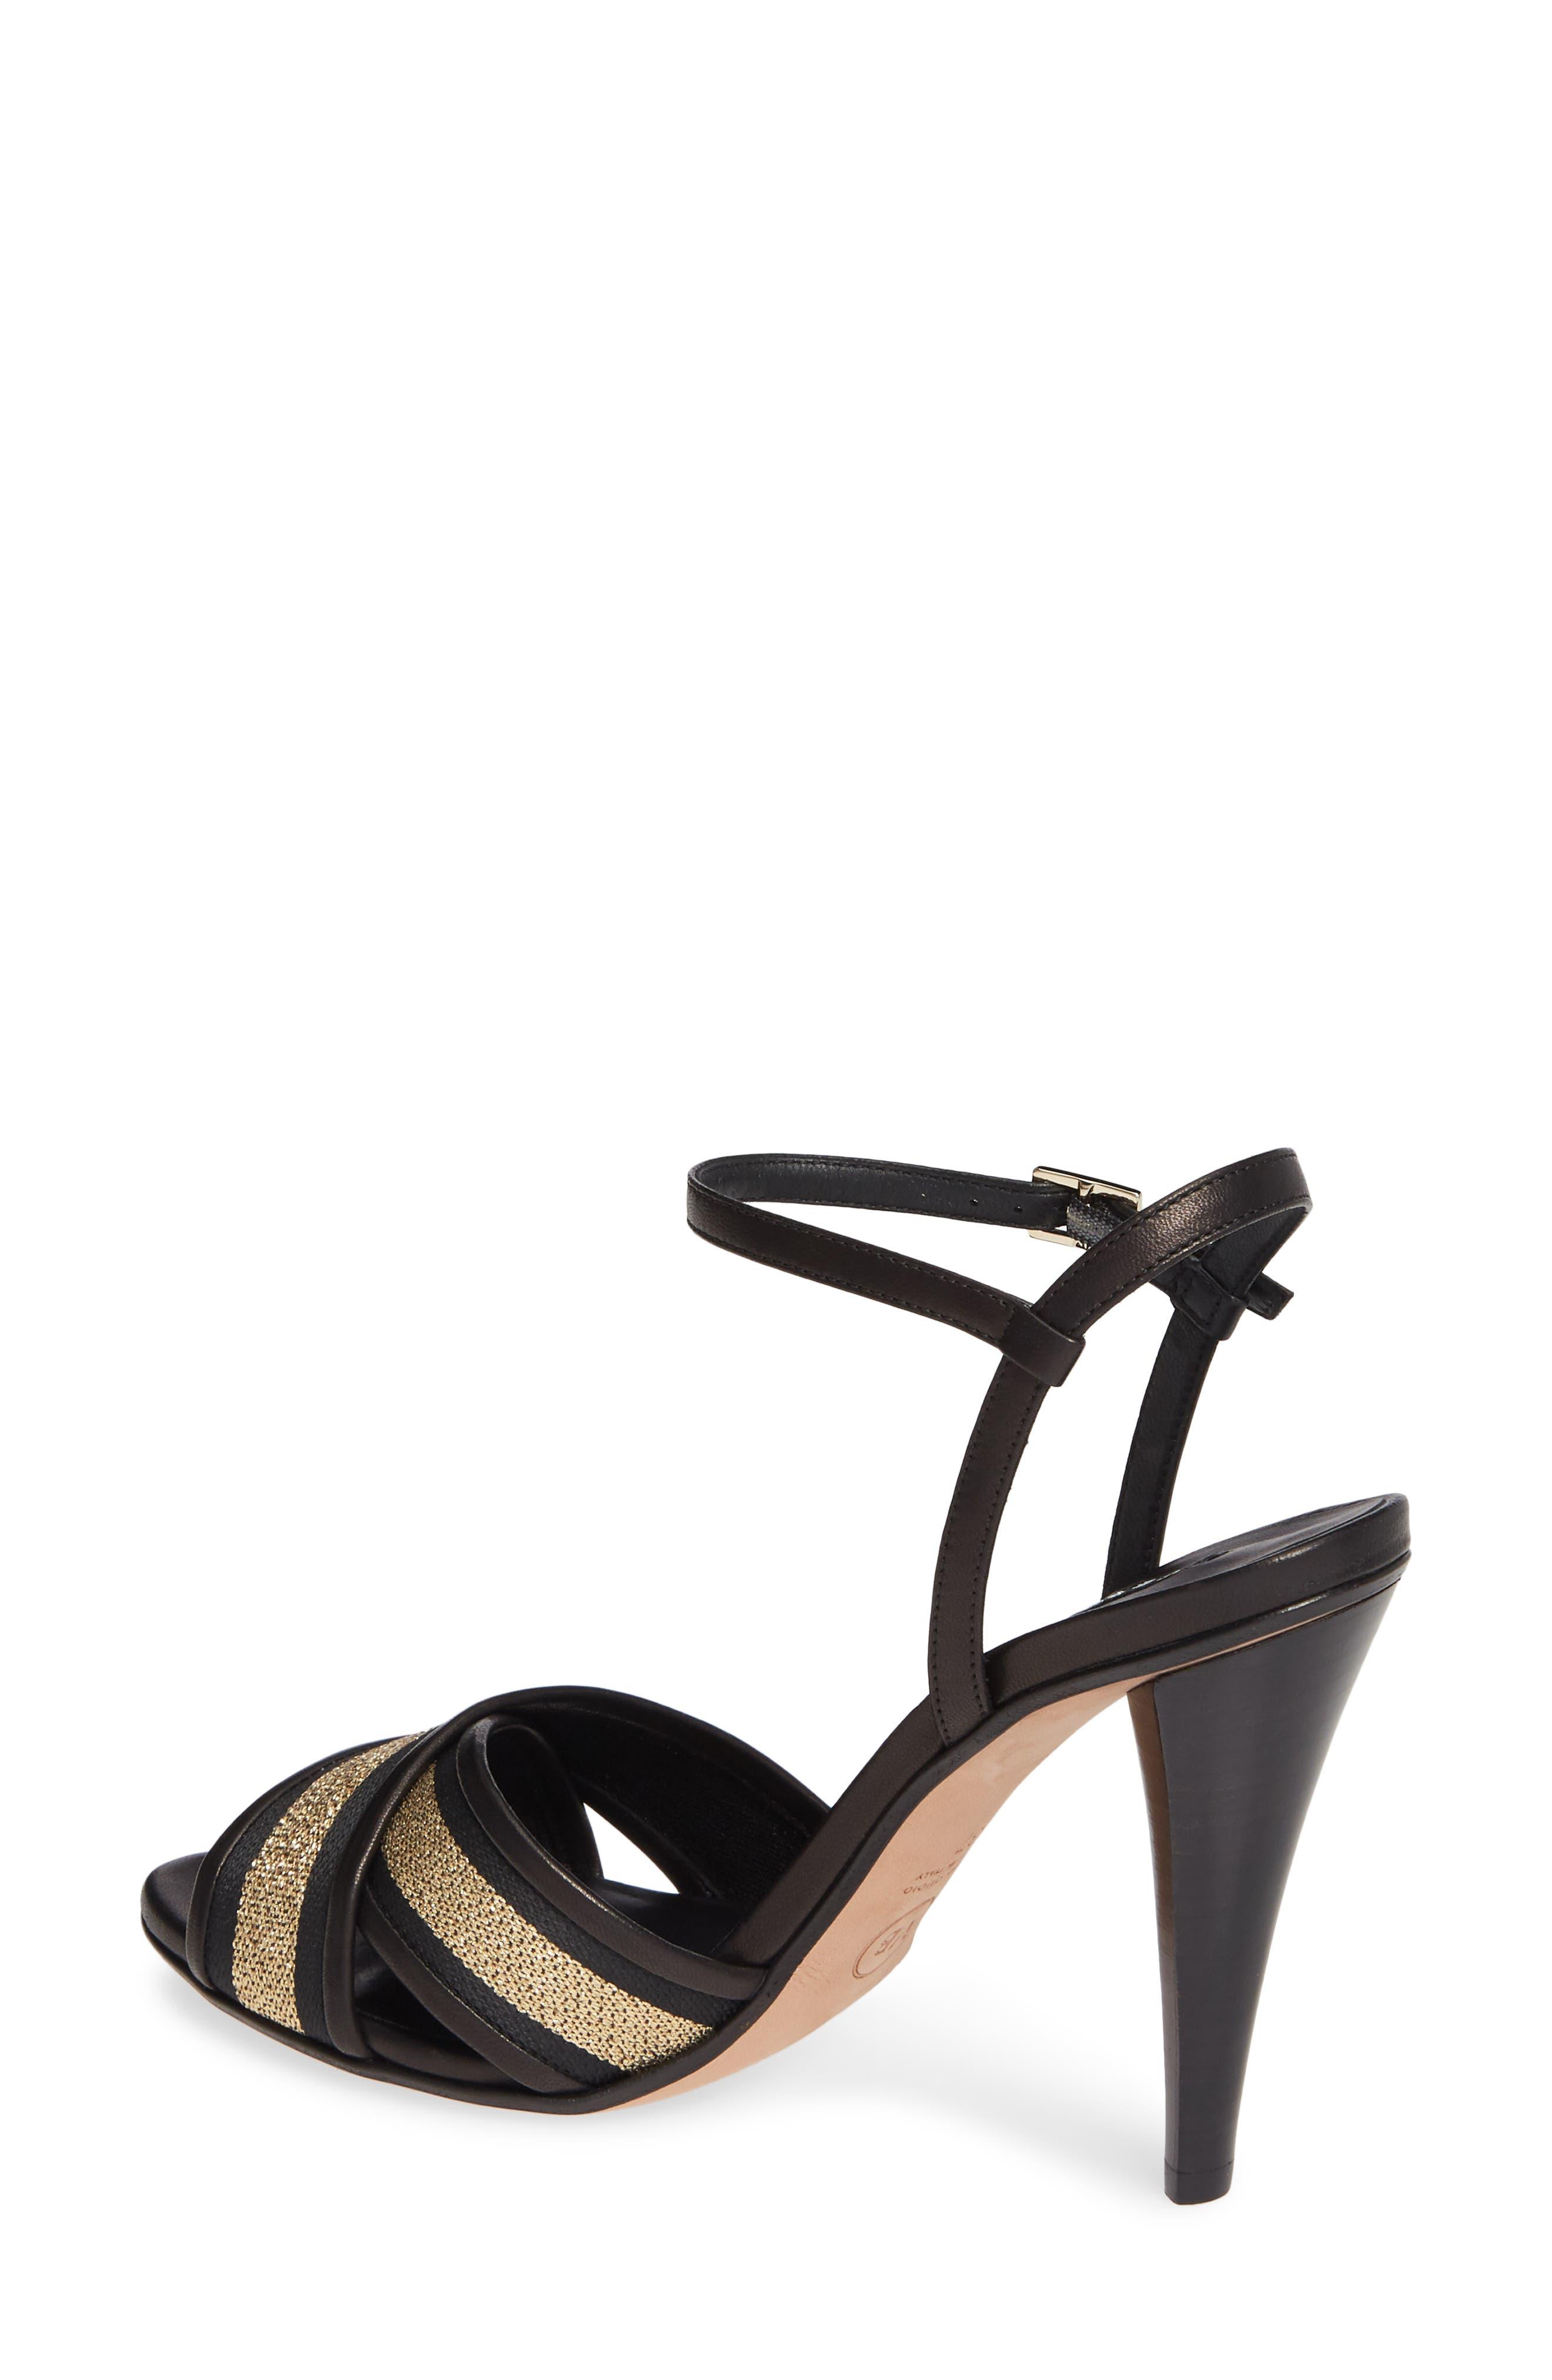 VERONICA BEARD,                             Olympia Quarter Strap Sandal,                             Alternate thumbnail 2, color,                             BLACK/ GOLD